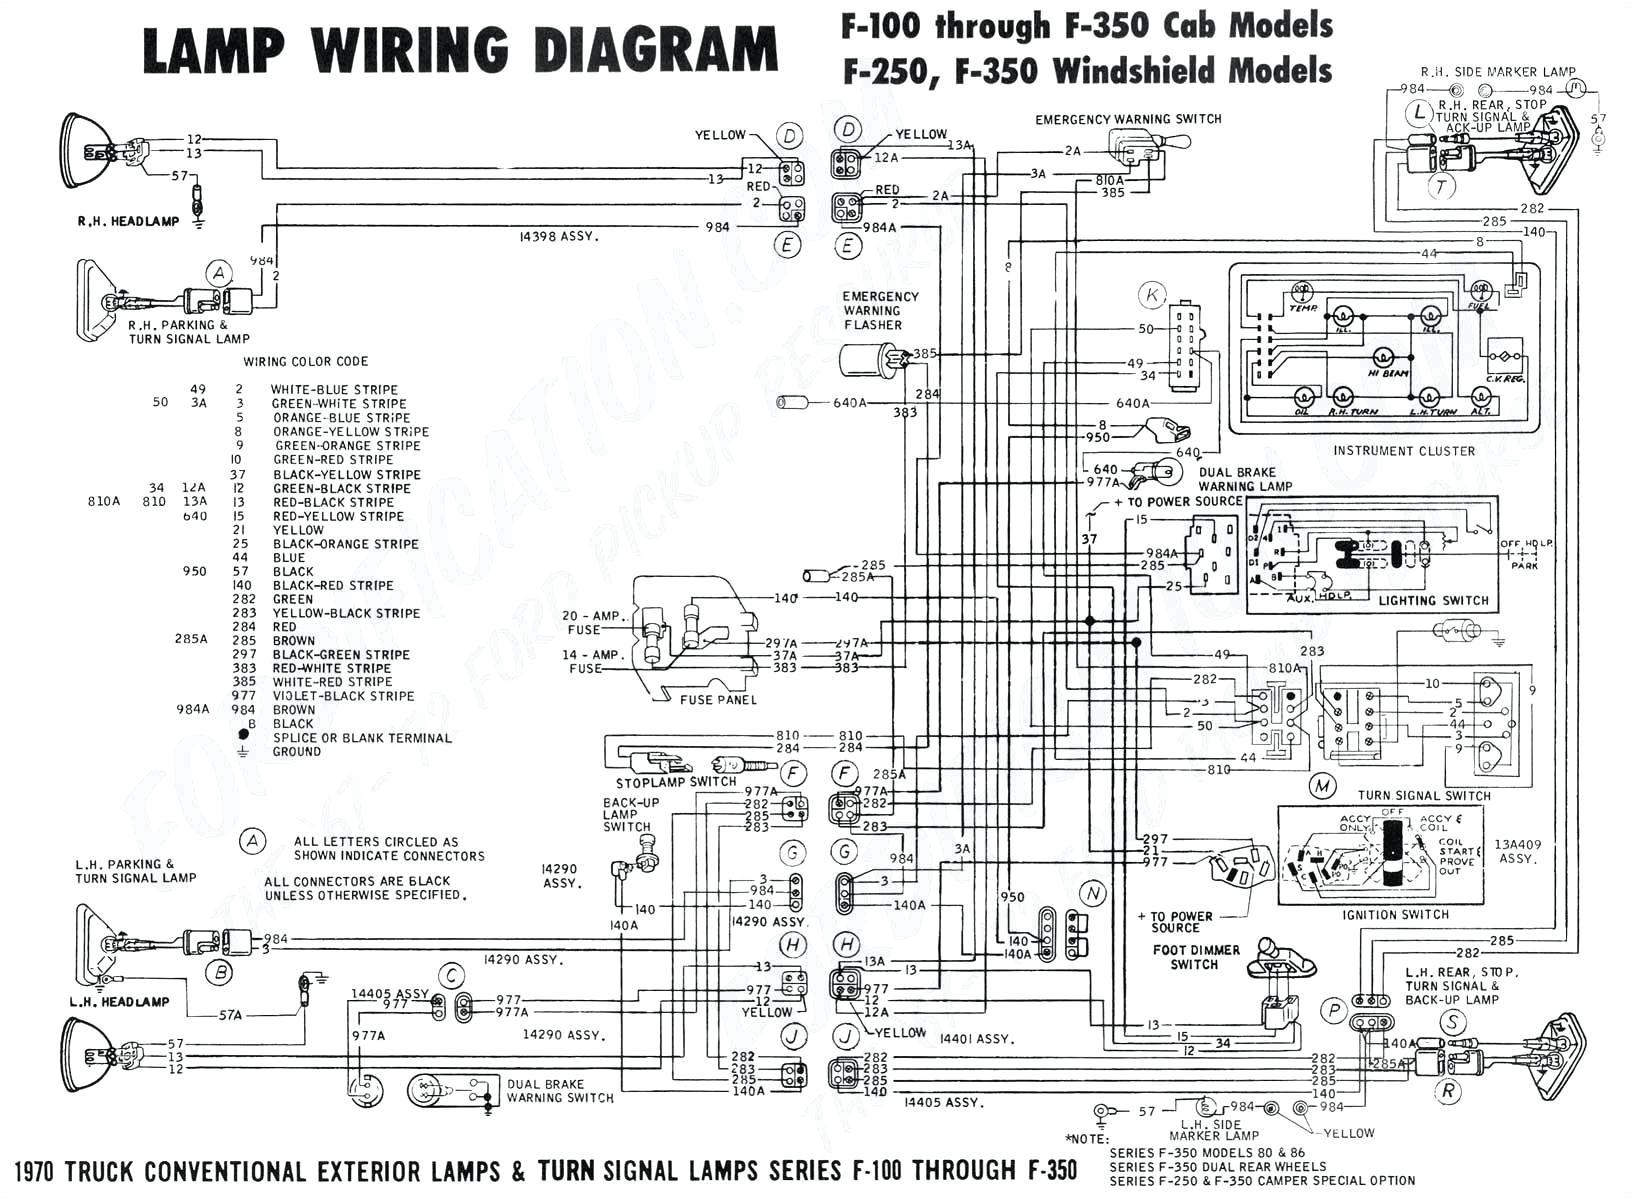 1988 Jeep Comanche Wiring Diagram Comanche Wiring Diagram Wiring Diagram Page